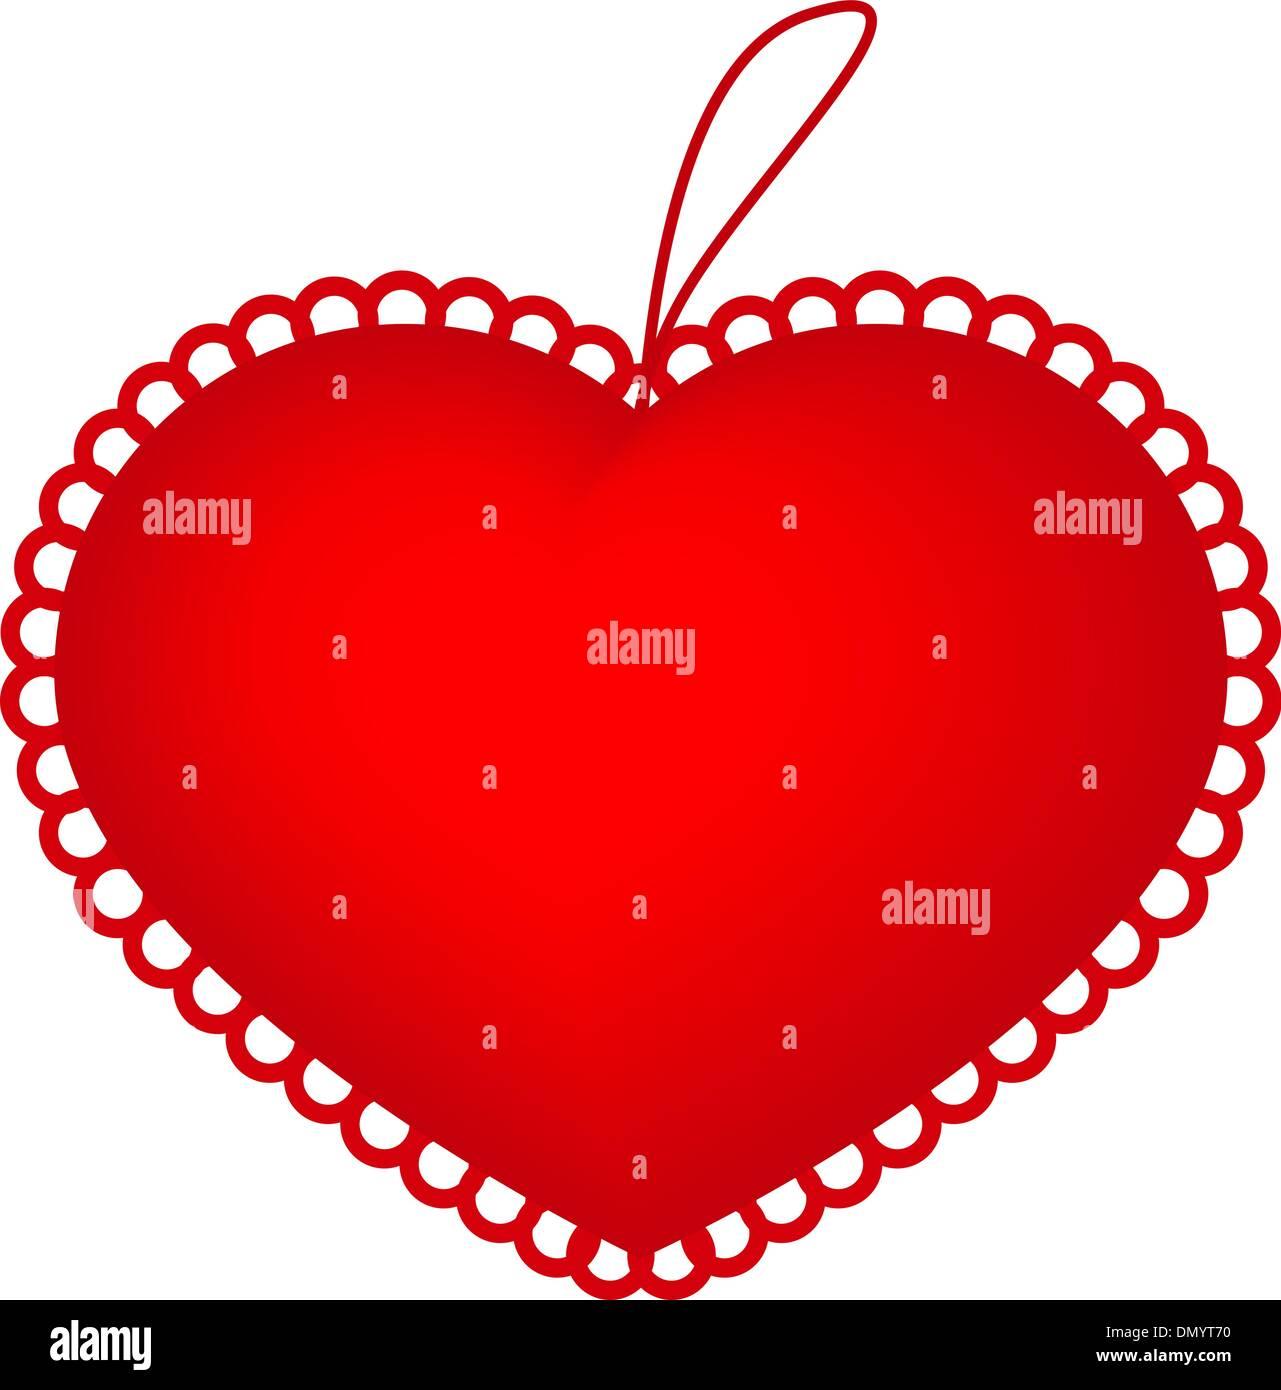 https www alamy com red heart pillow image64535940 html